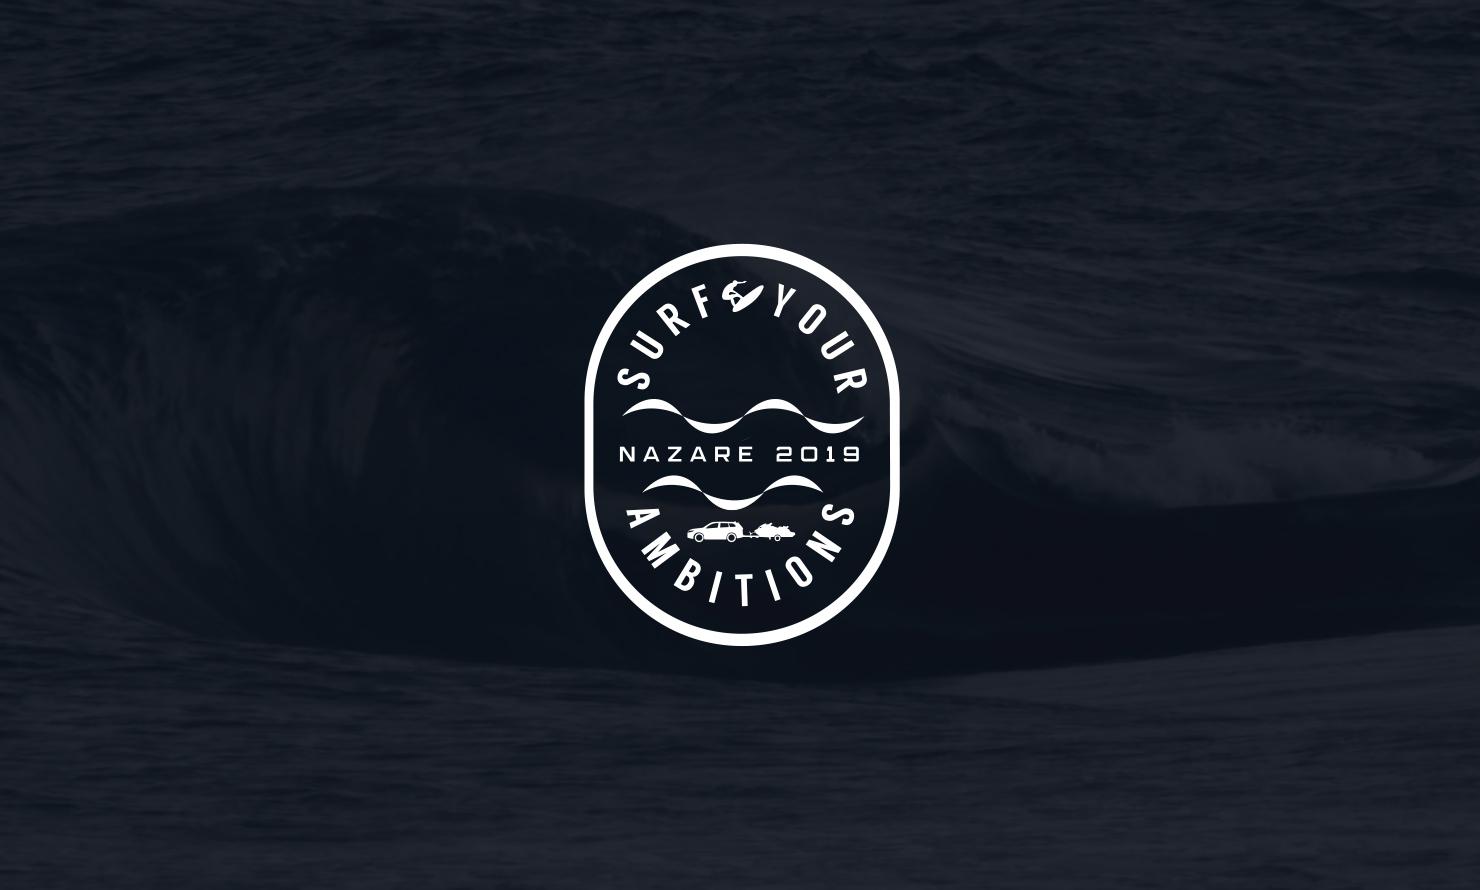 https://www.kubelibre.com/uploads/Slider-work-tutti-clienti/mitsubishi-outlander-phev-be-part-of-the-energy-nazaré-alessandro-marcianò-logo-nazaré-2019.jpg